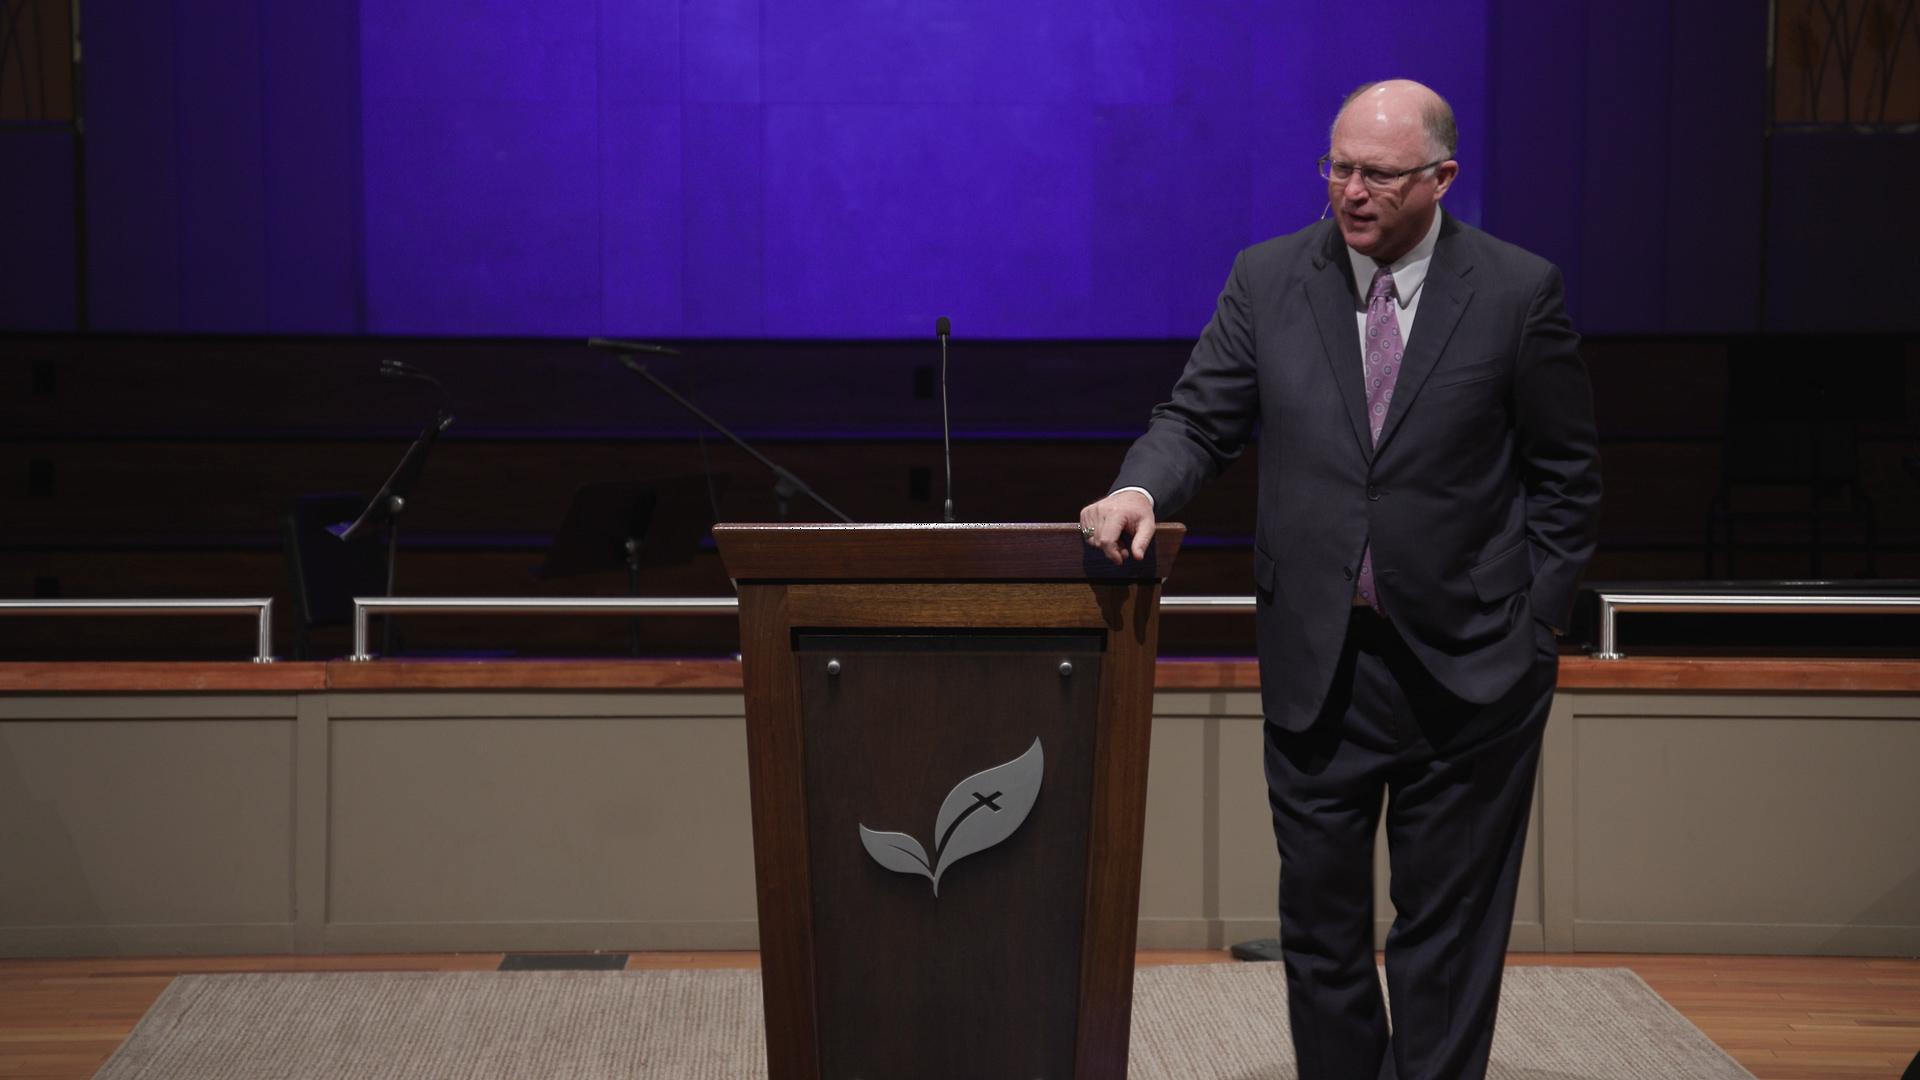 Pastor Paul Chappell: Choosing to Trust